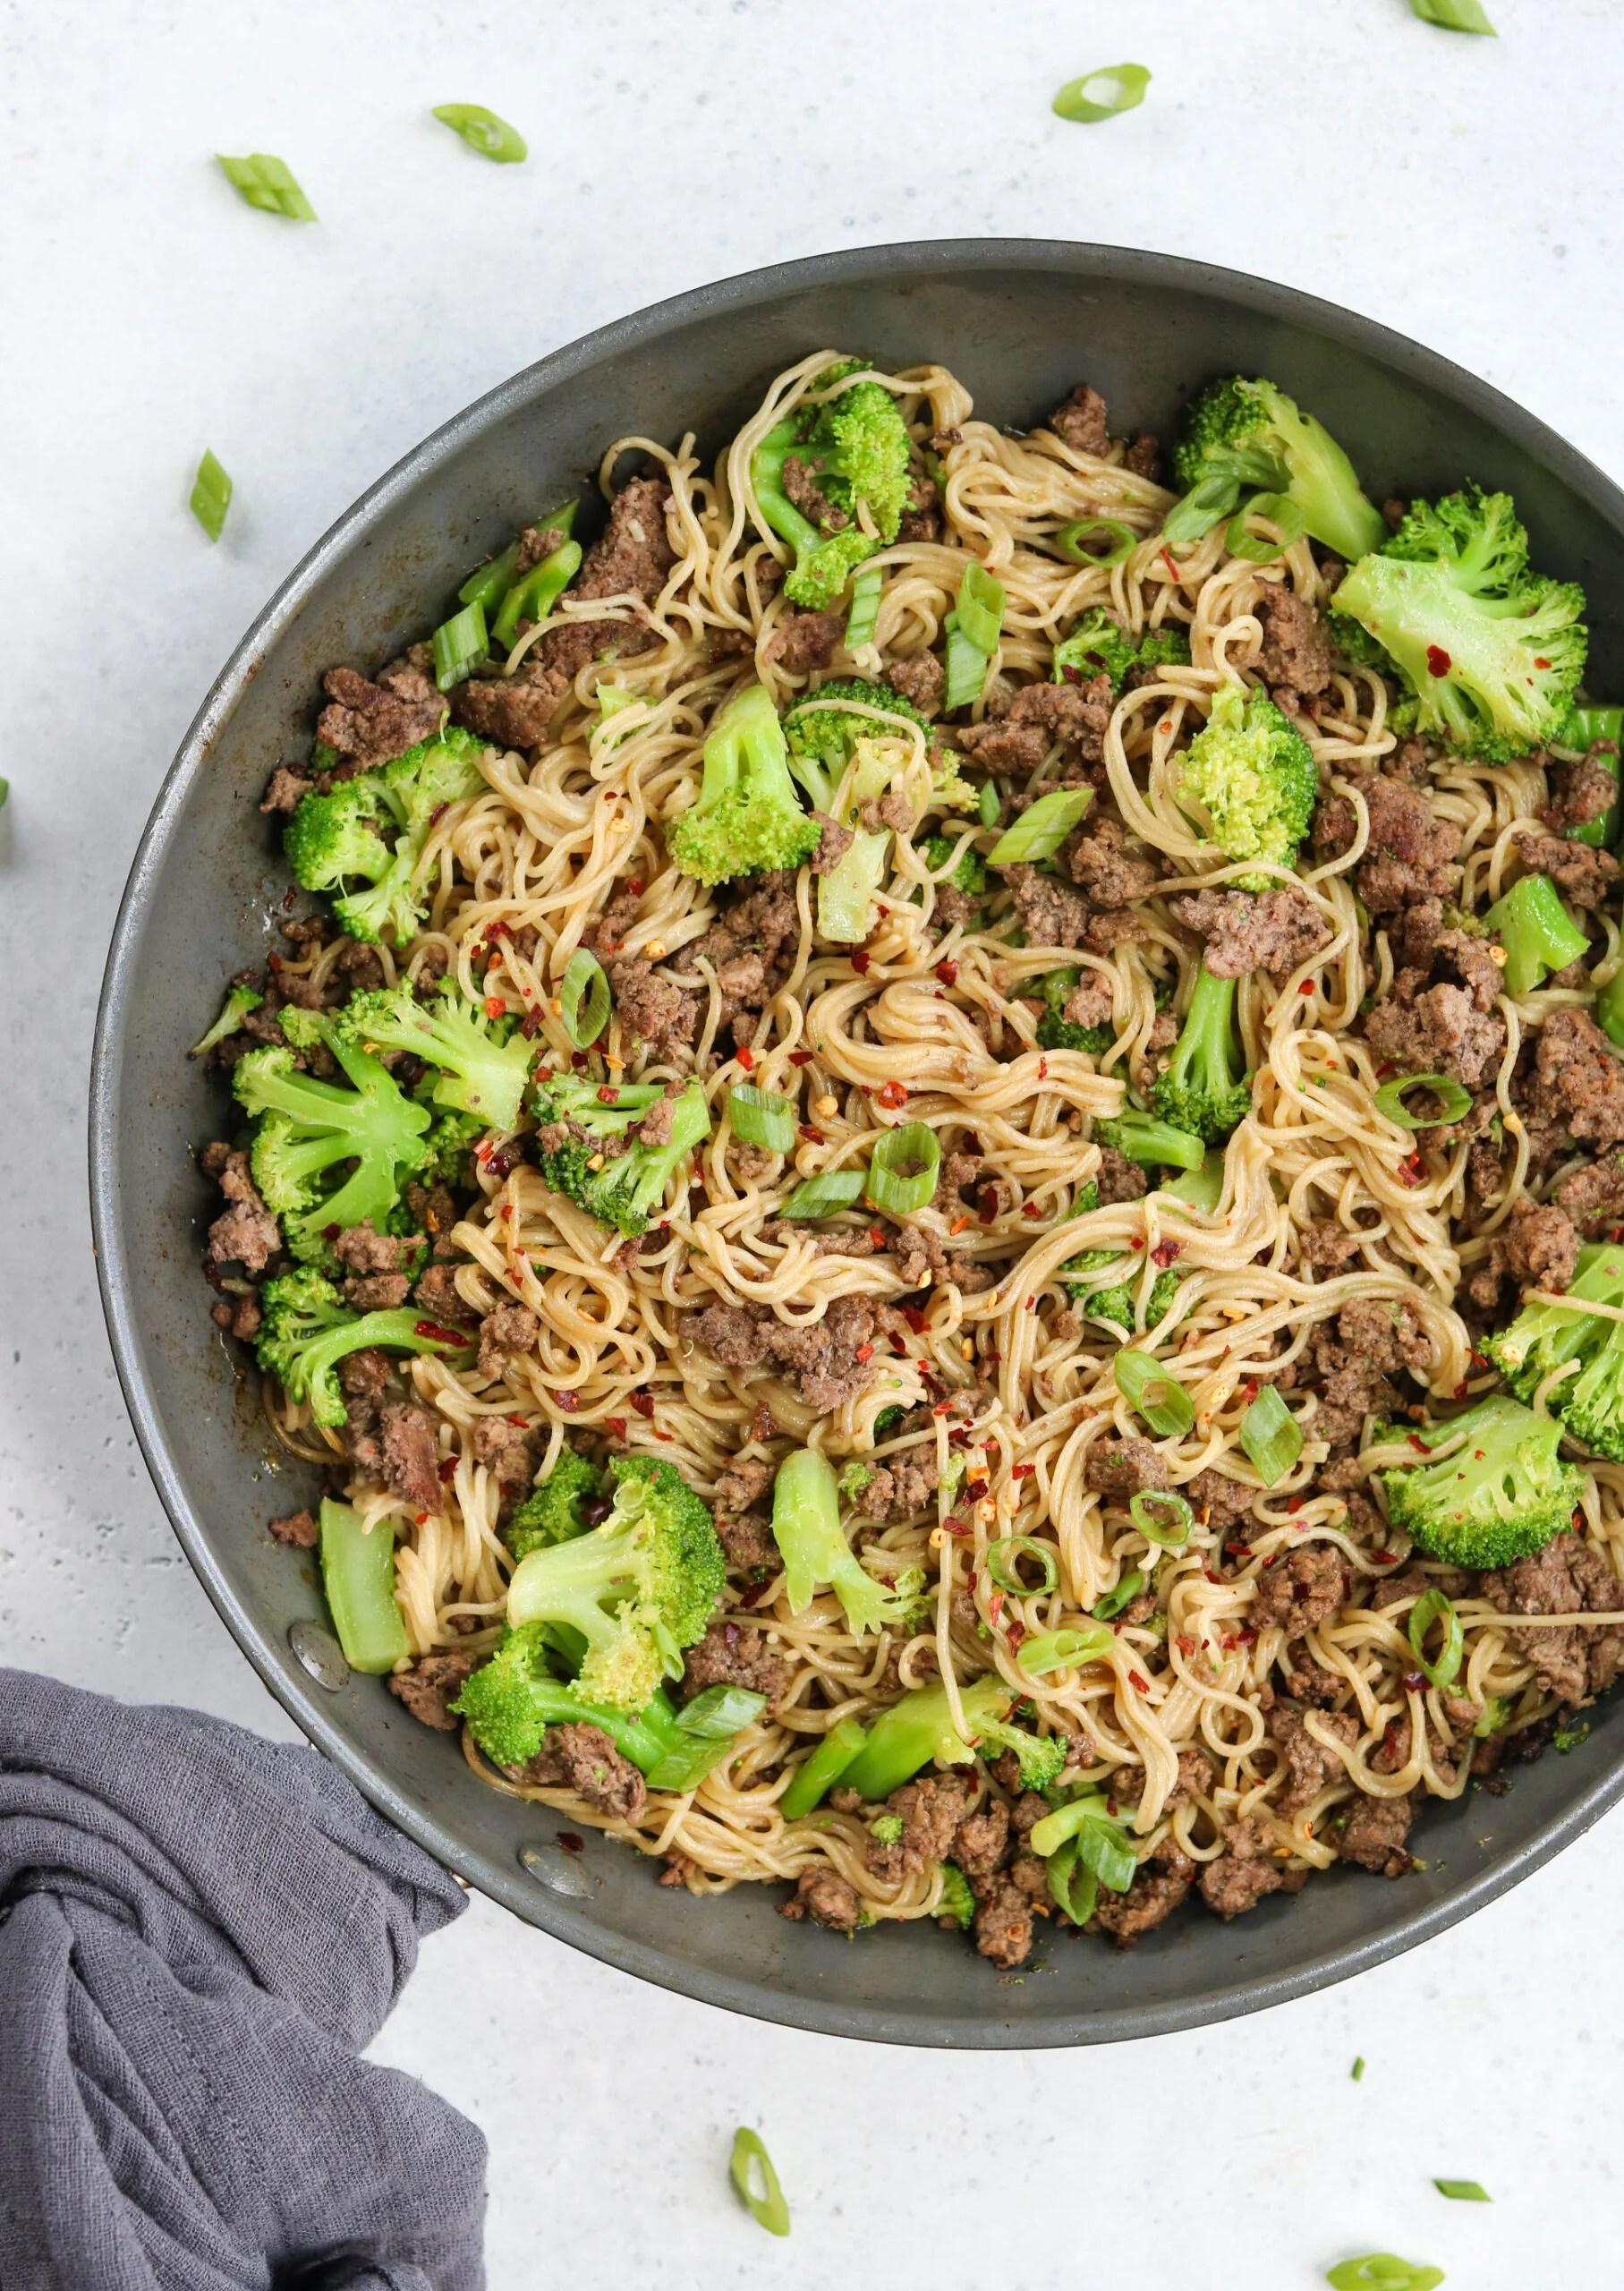 Beef and Broccoli Ramen Stir Fry (Gluten Free)